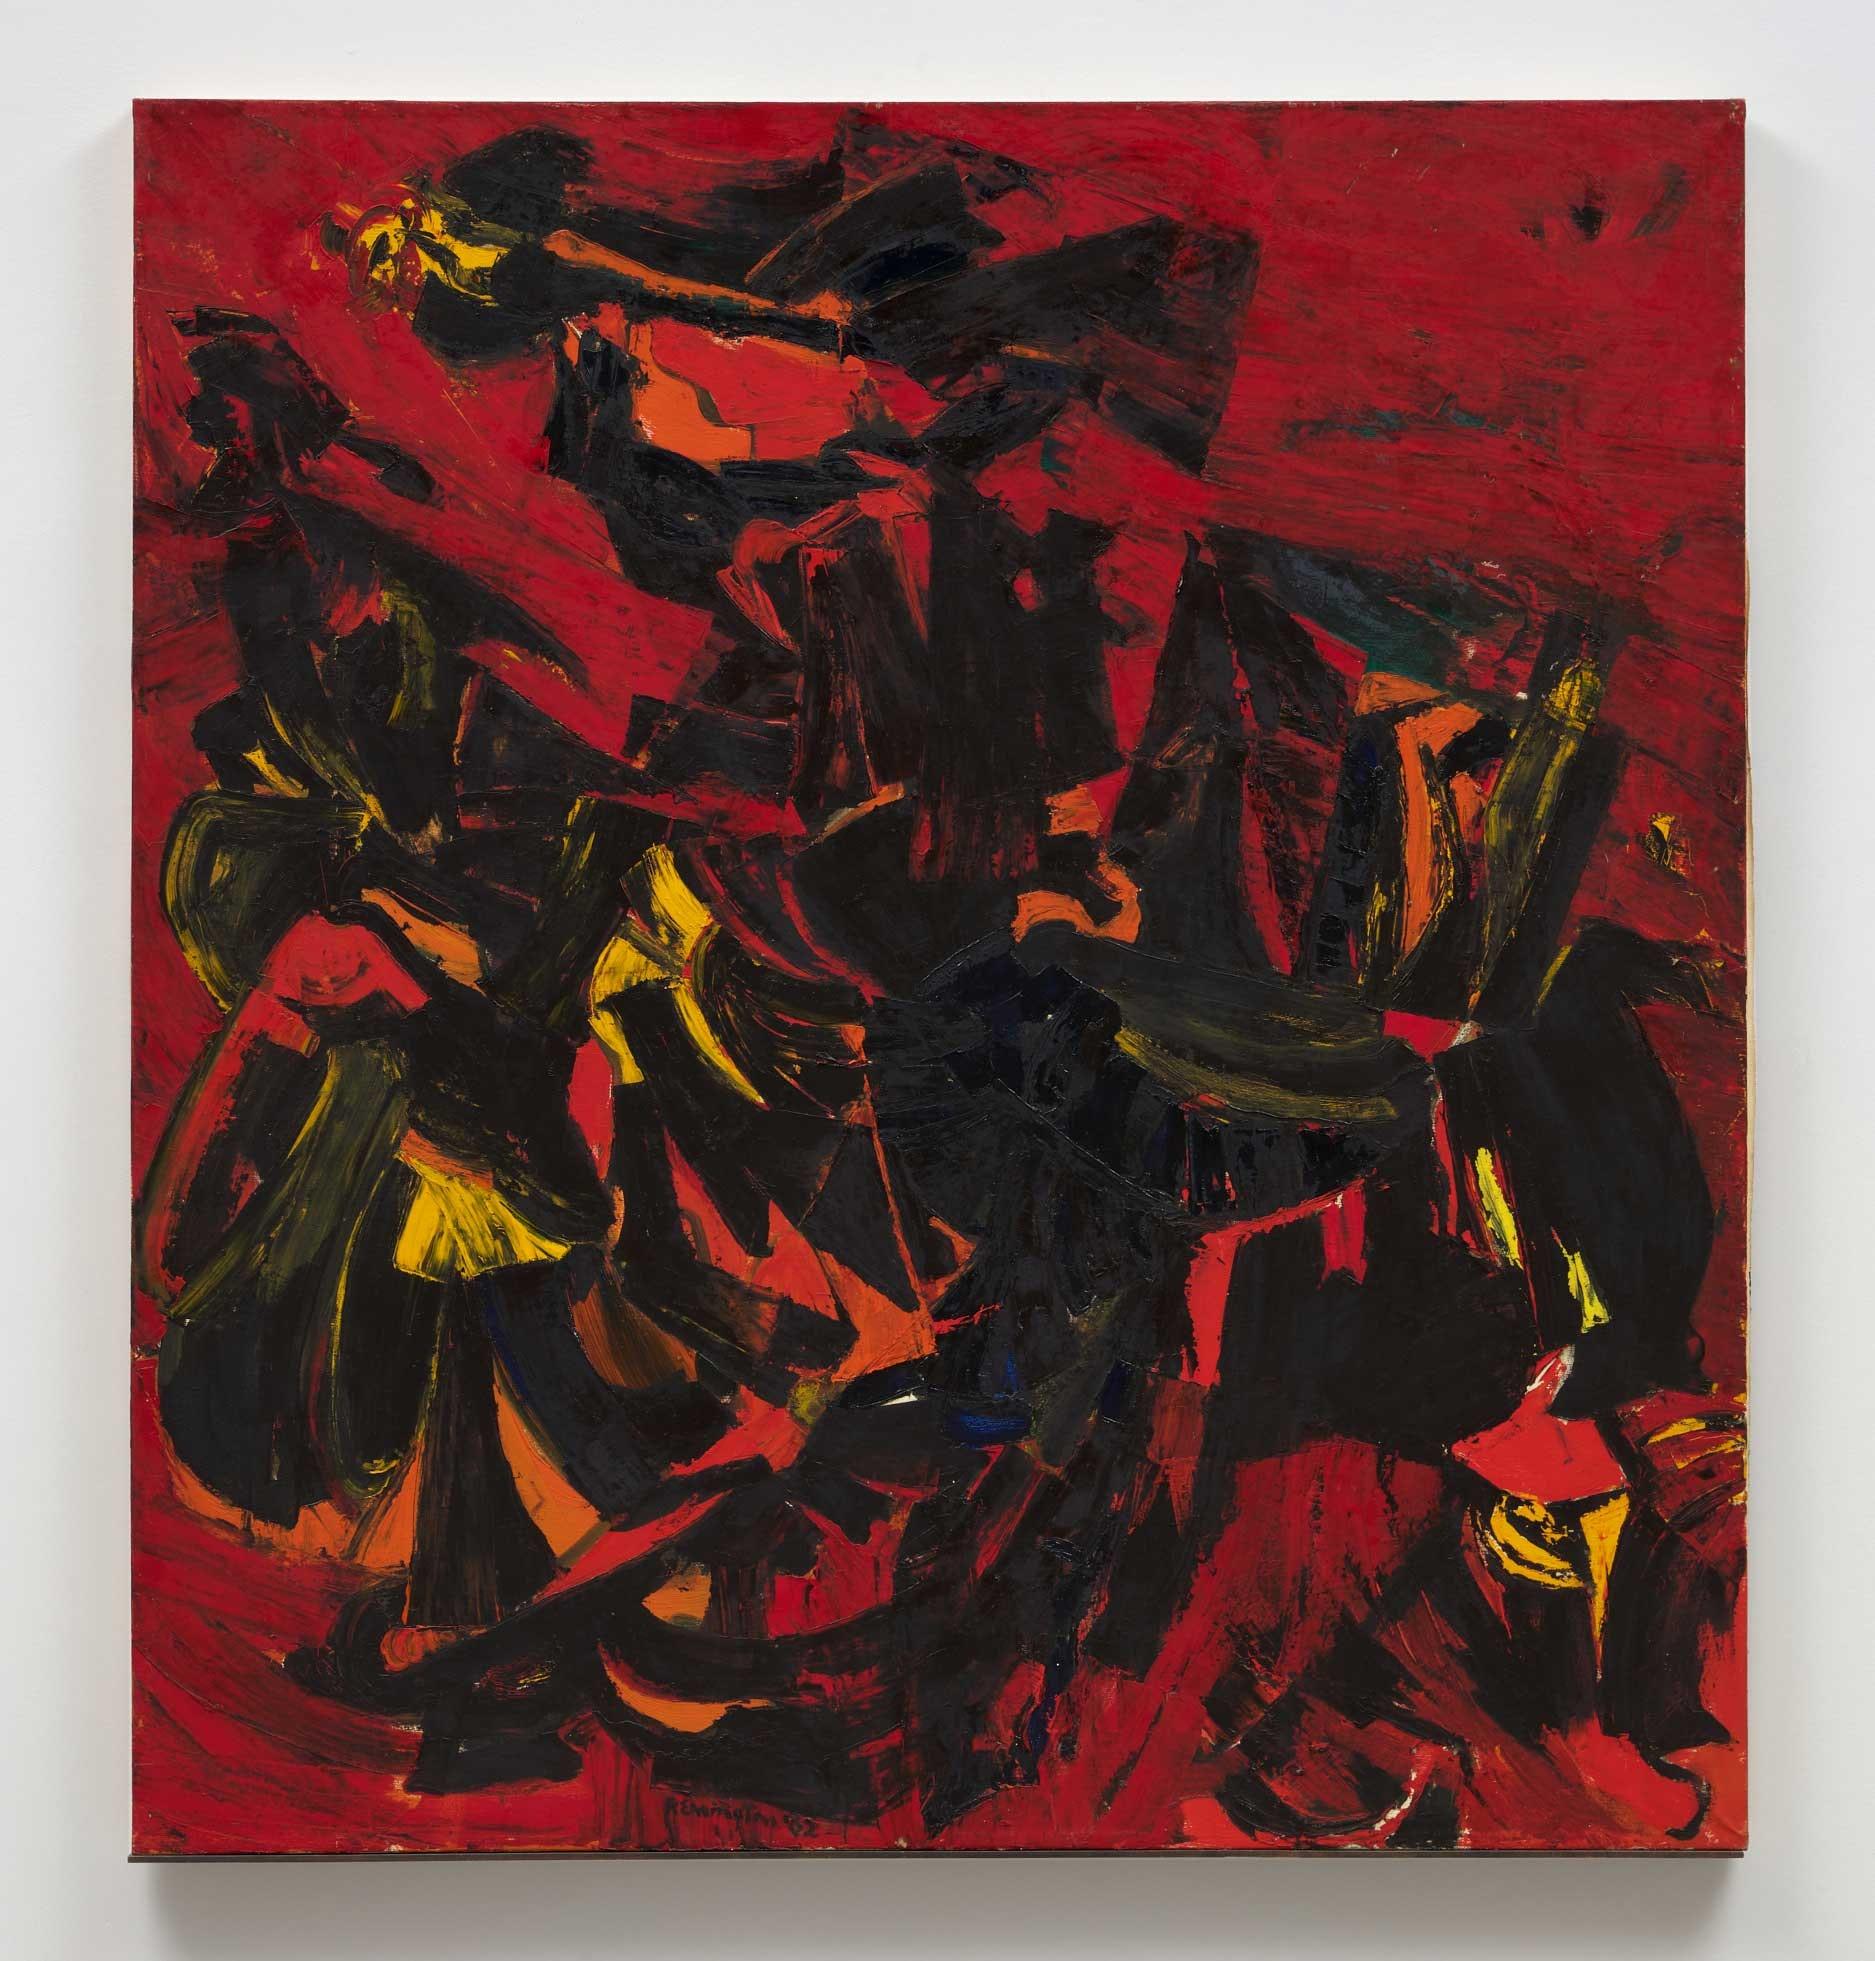 Deborah Remington, <em>Big Red</em>, 1962. Oil on canvas, 75 x 69 inches. Courtesy The Deborah Remington Trust and Bortolami Gallery, New York.